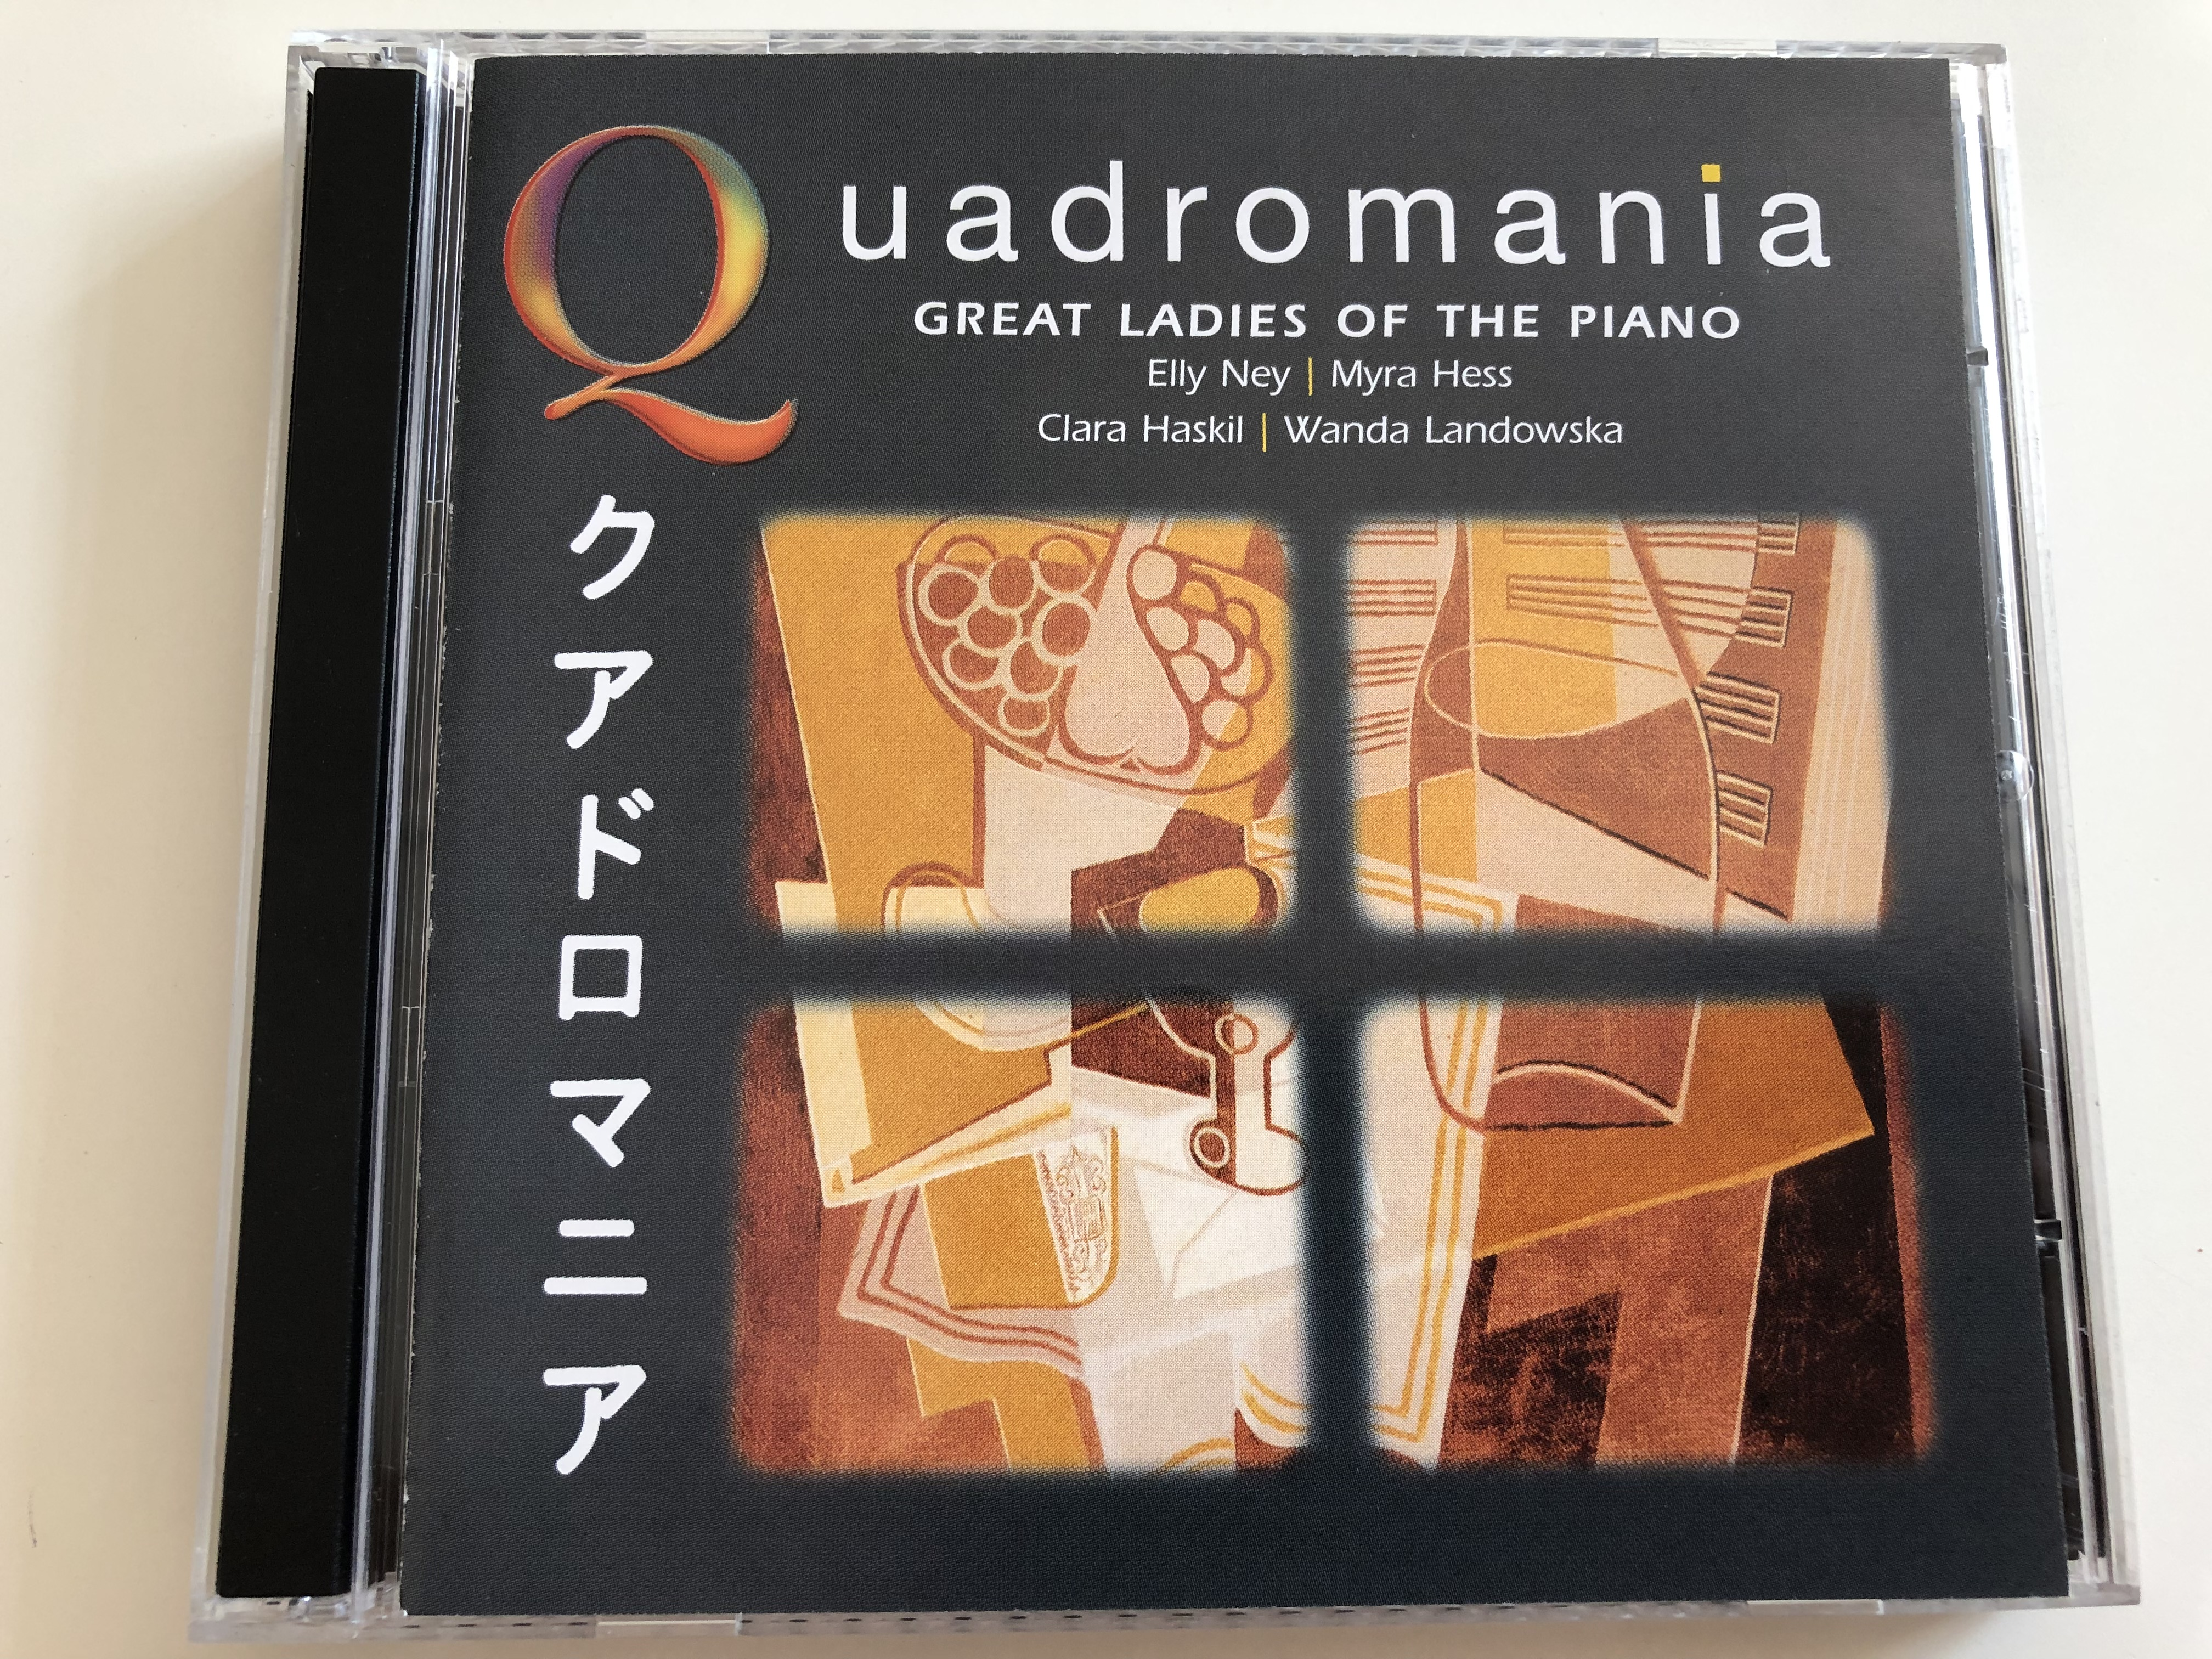 quadromania-great-ladies-of-the-piano-elly-ney-myra-hess-clara-haskil-wanda-landowska-beethoven-brahms-bach-scarlatti-mozart-4-cd-set-membran-1-.jpg